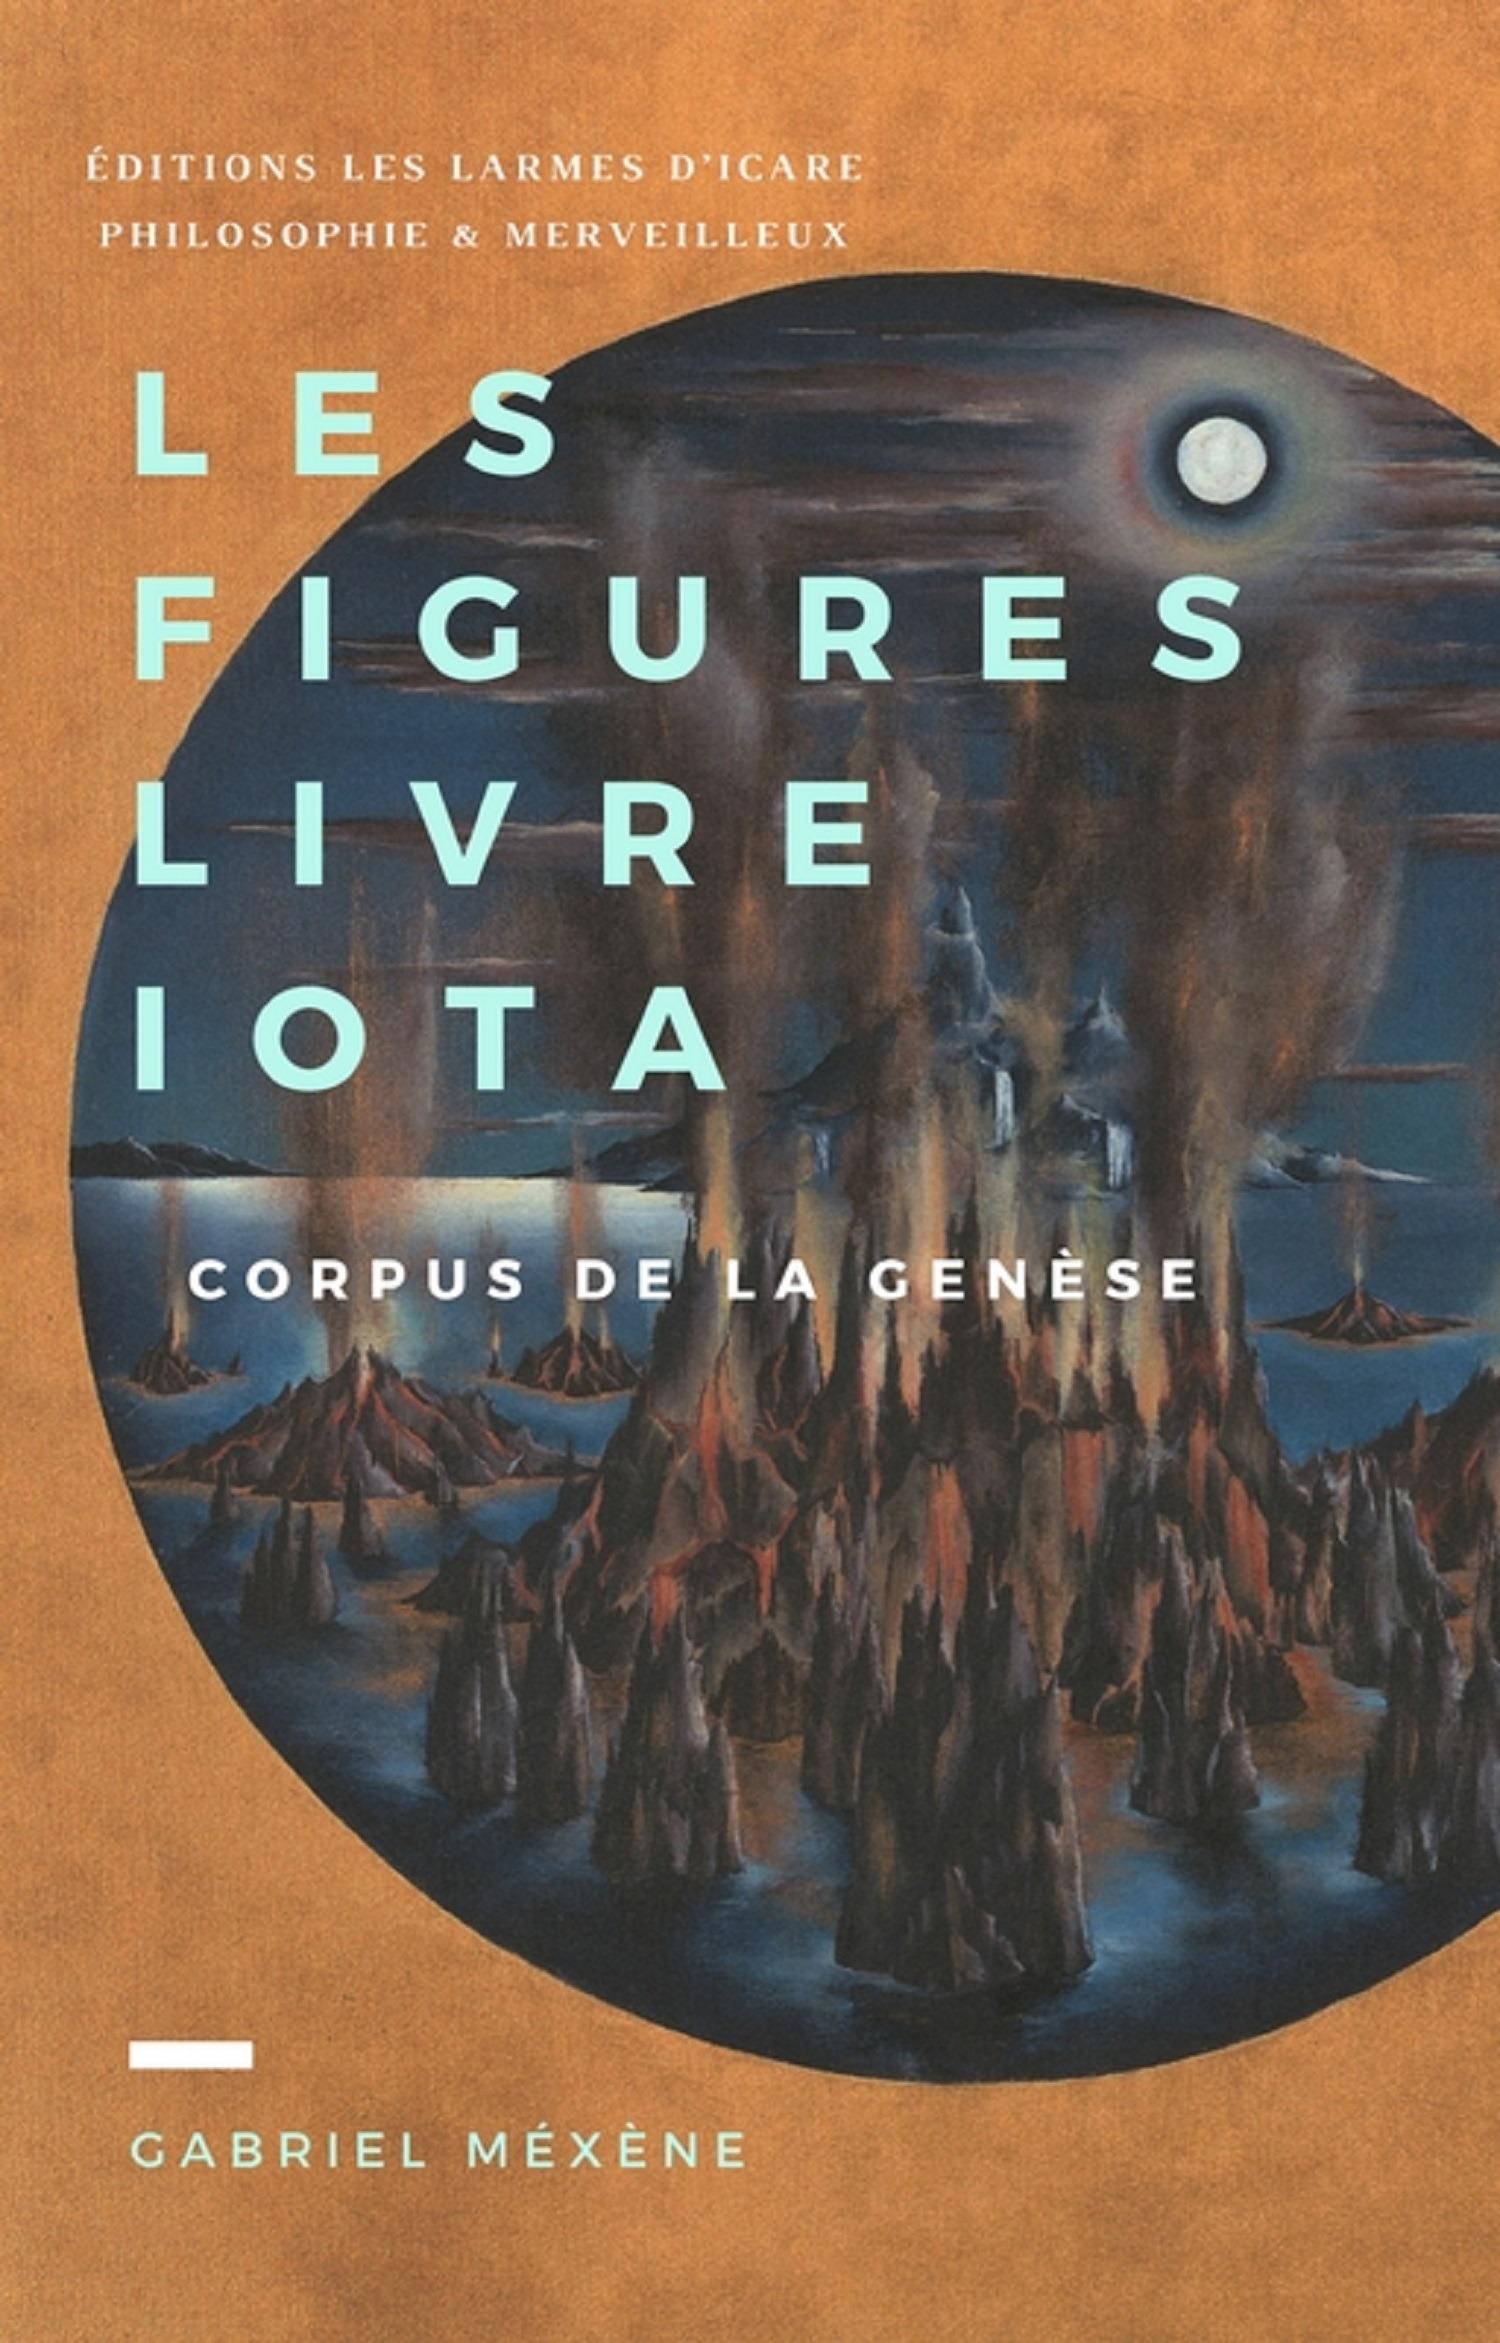 Les Figures, Livre Iota